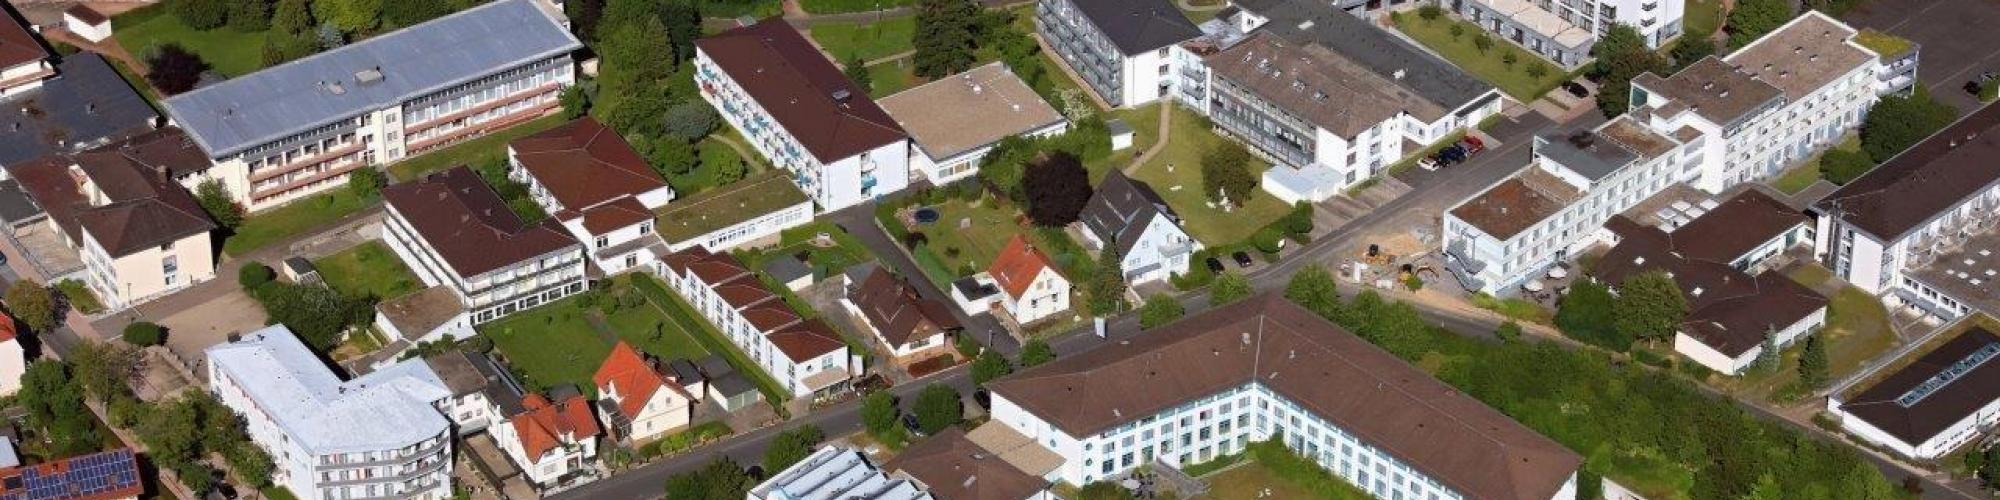 MEDICLIN Kliniken Bad Wildungen